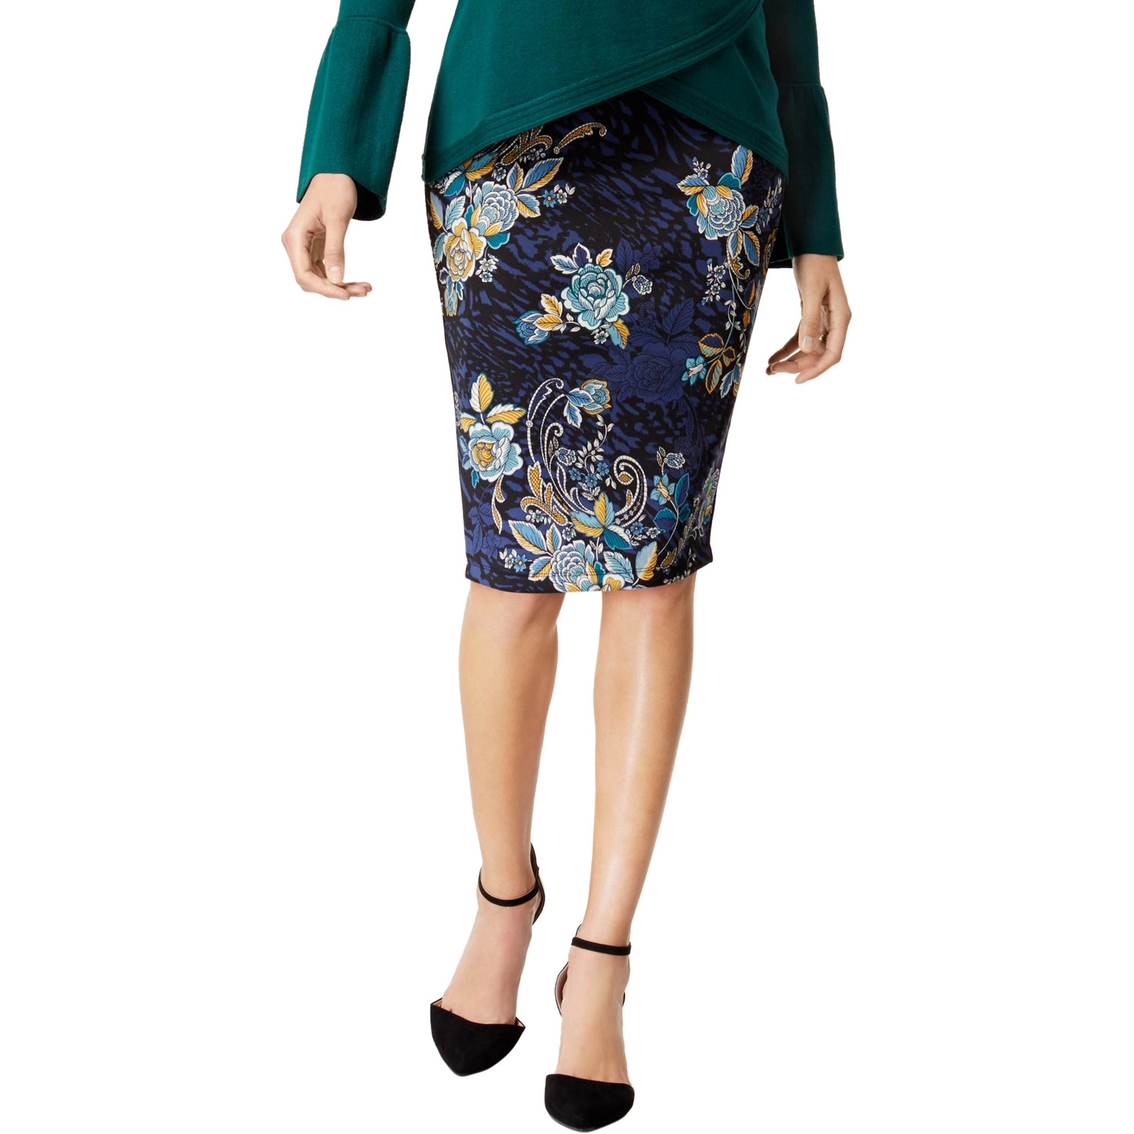 430df2ea52 Thalia Sodi Printed Pull-on Pencil Skirt | Skirts | Apparel | Shop ...